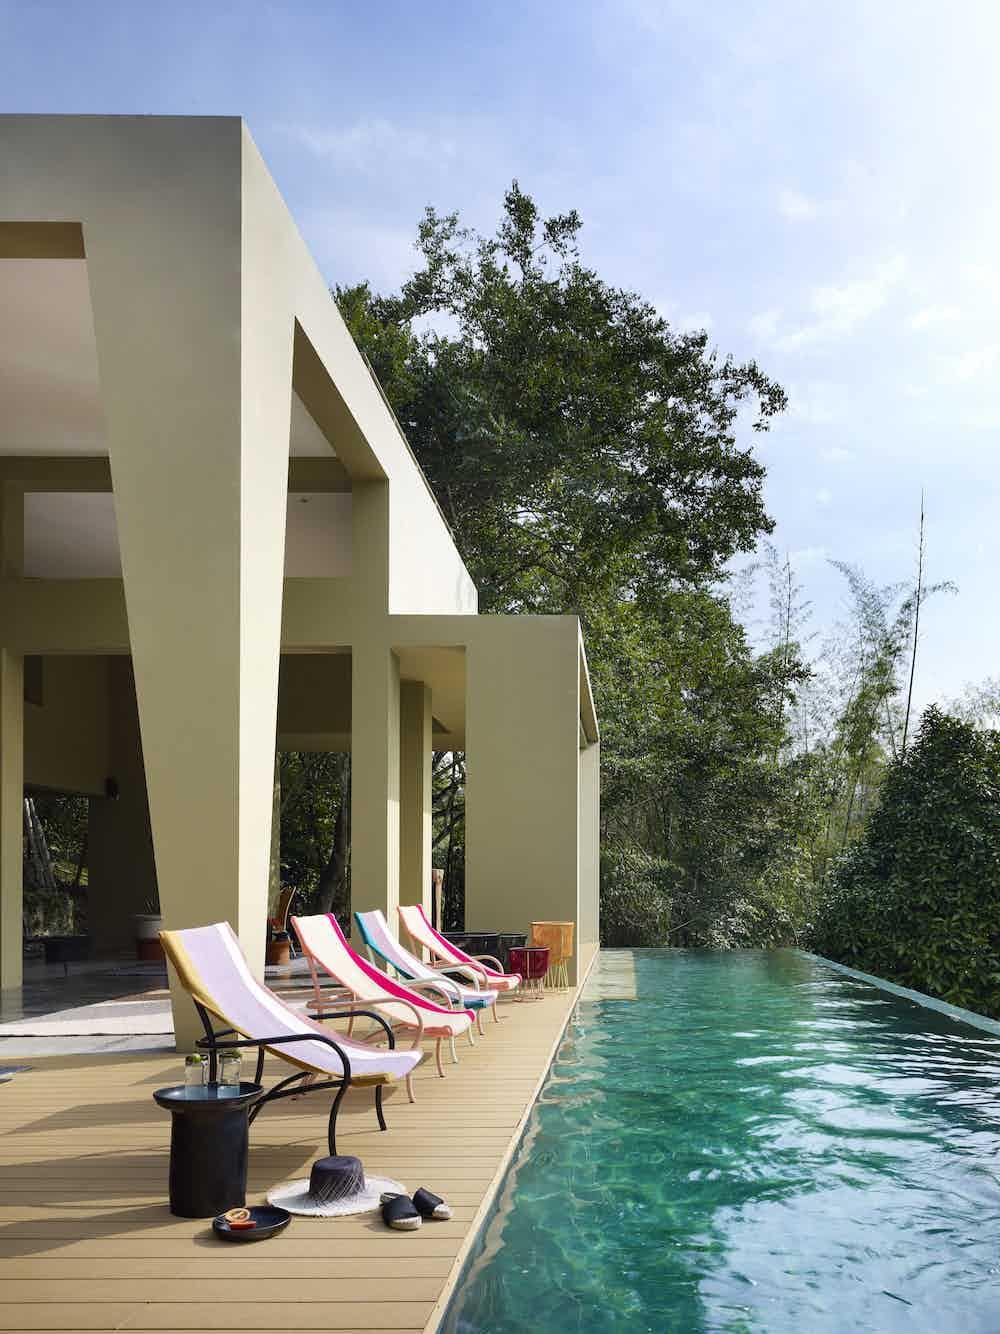 Ames furniture design maraca lounge chair haute living